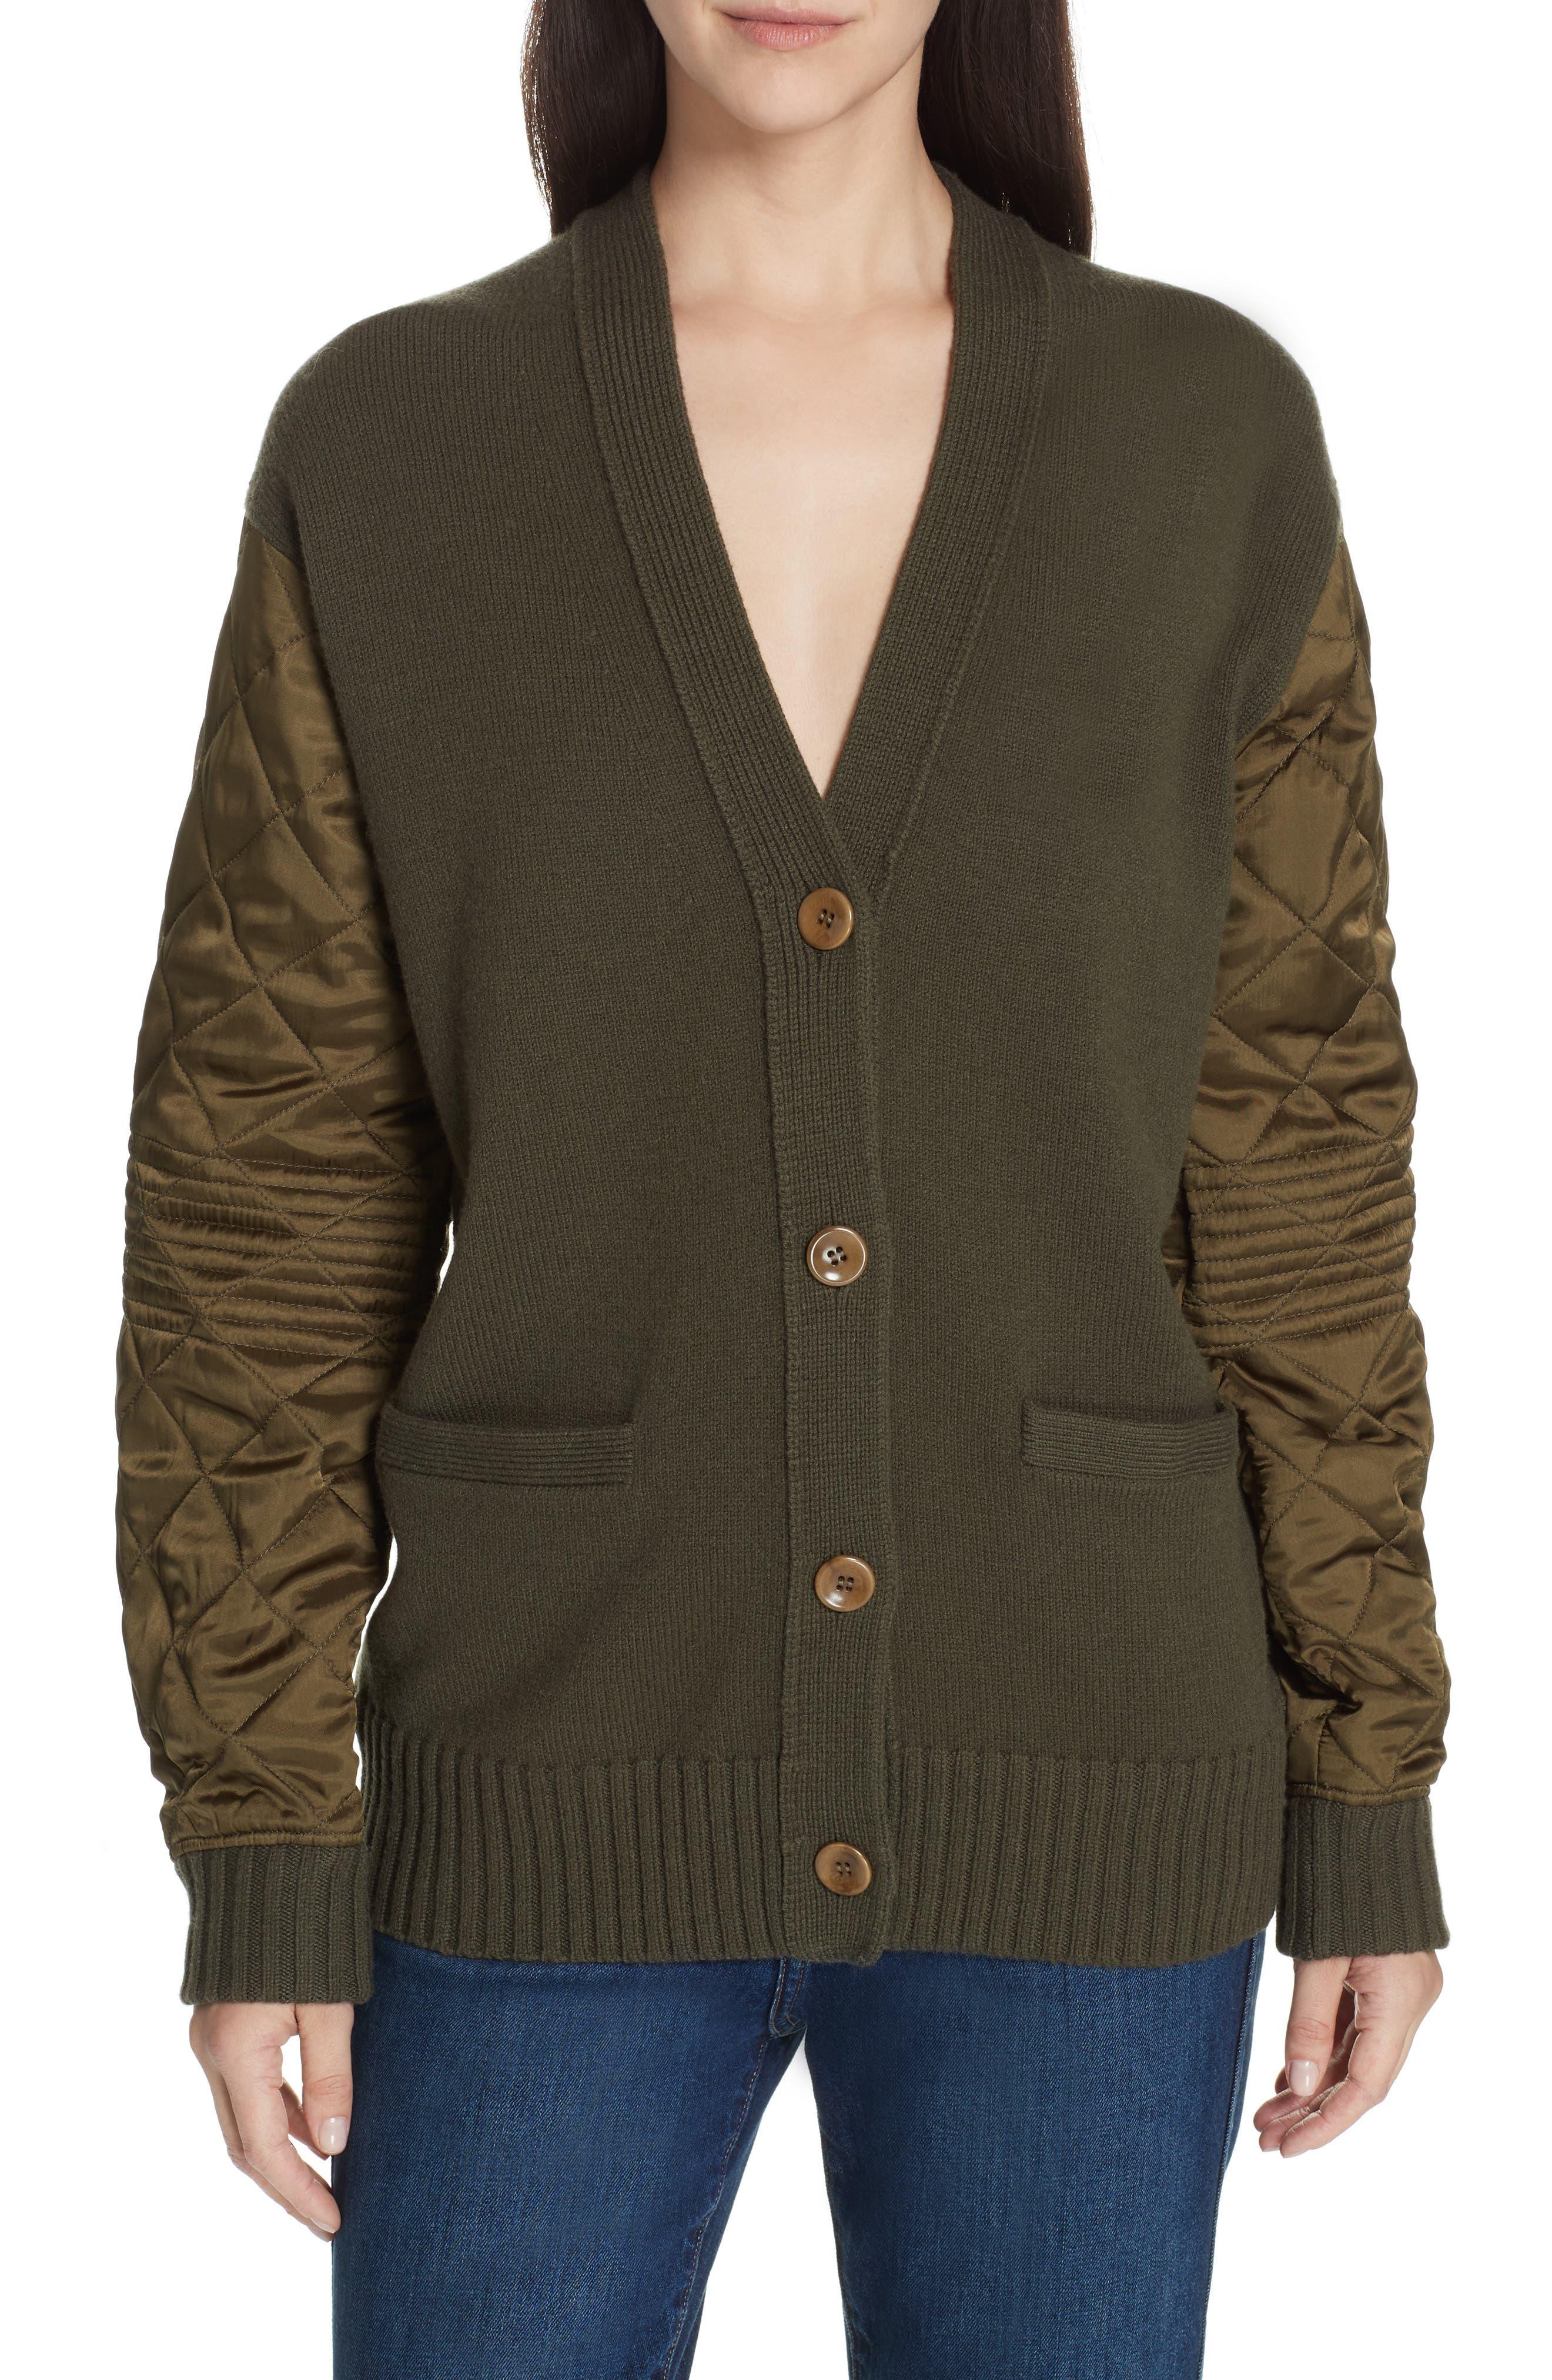 Proenza Schouler Pswl Quilted Sleeve Merino Wool Cardigan, Green